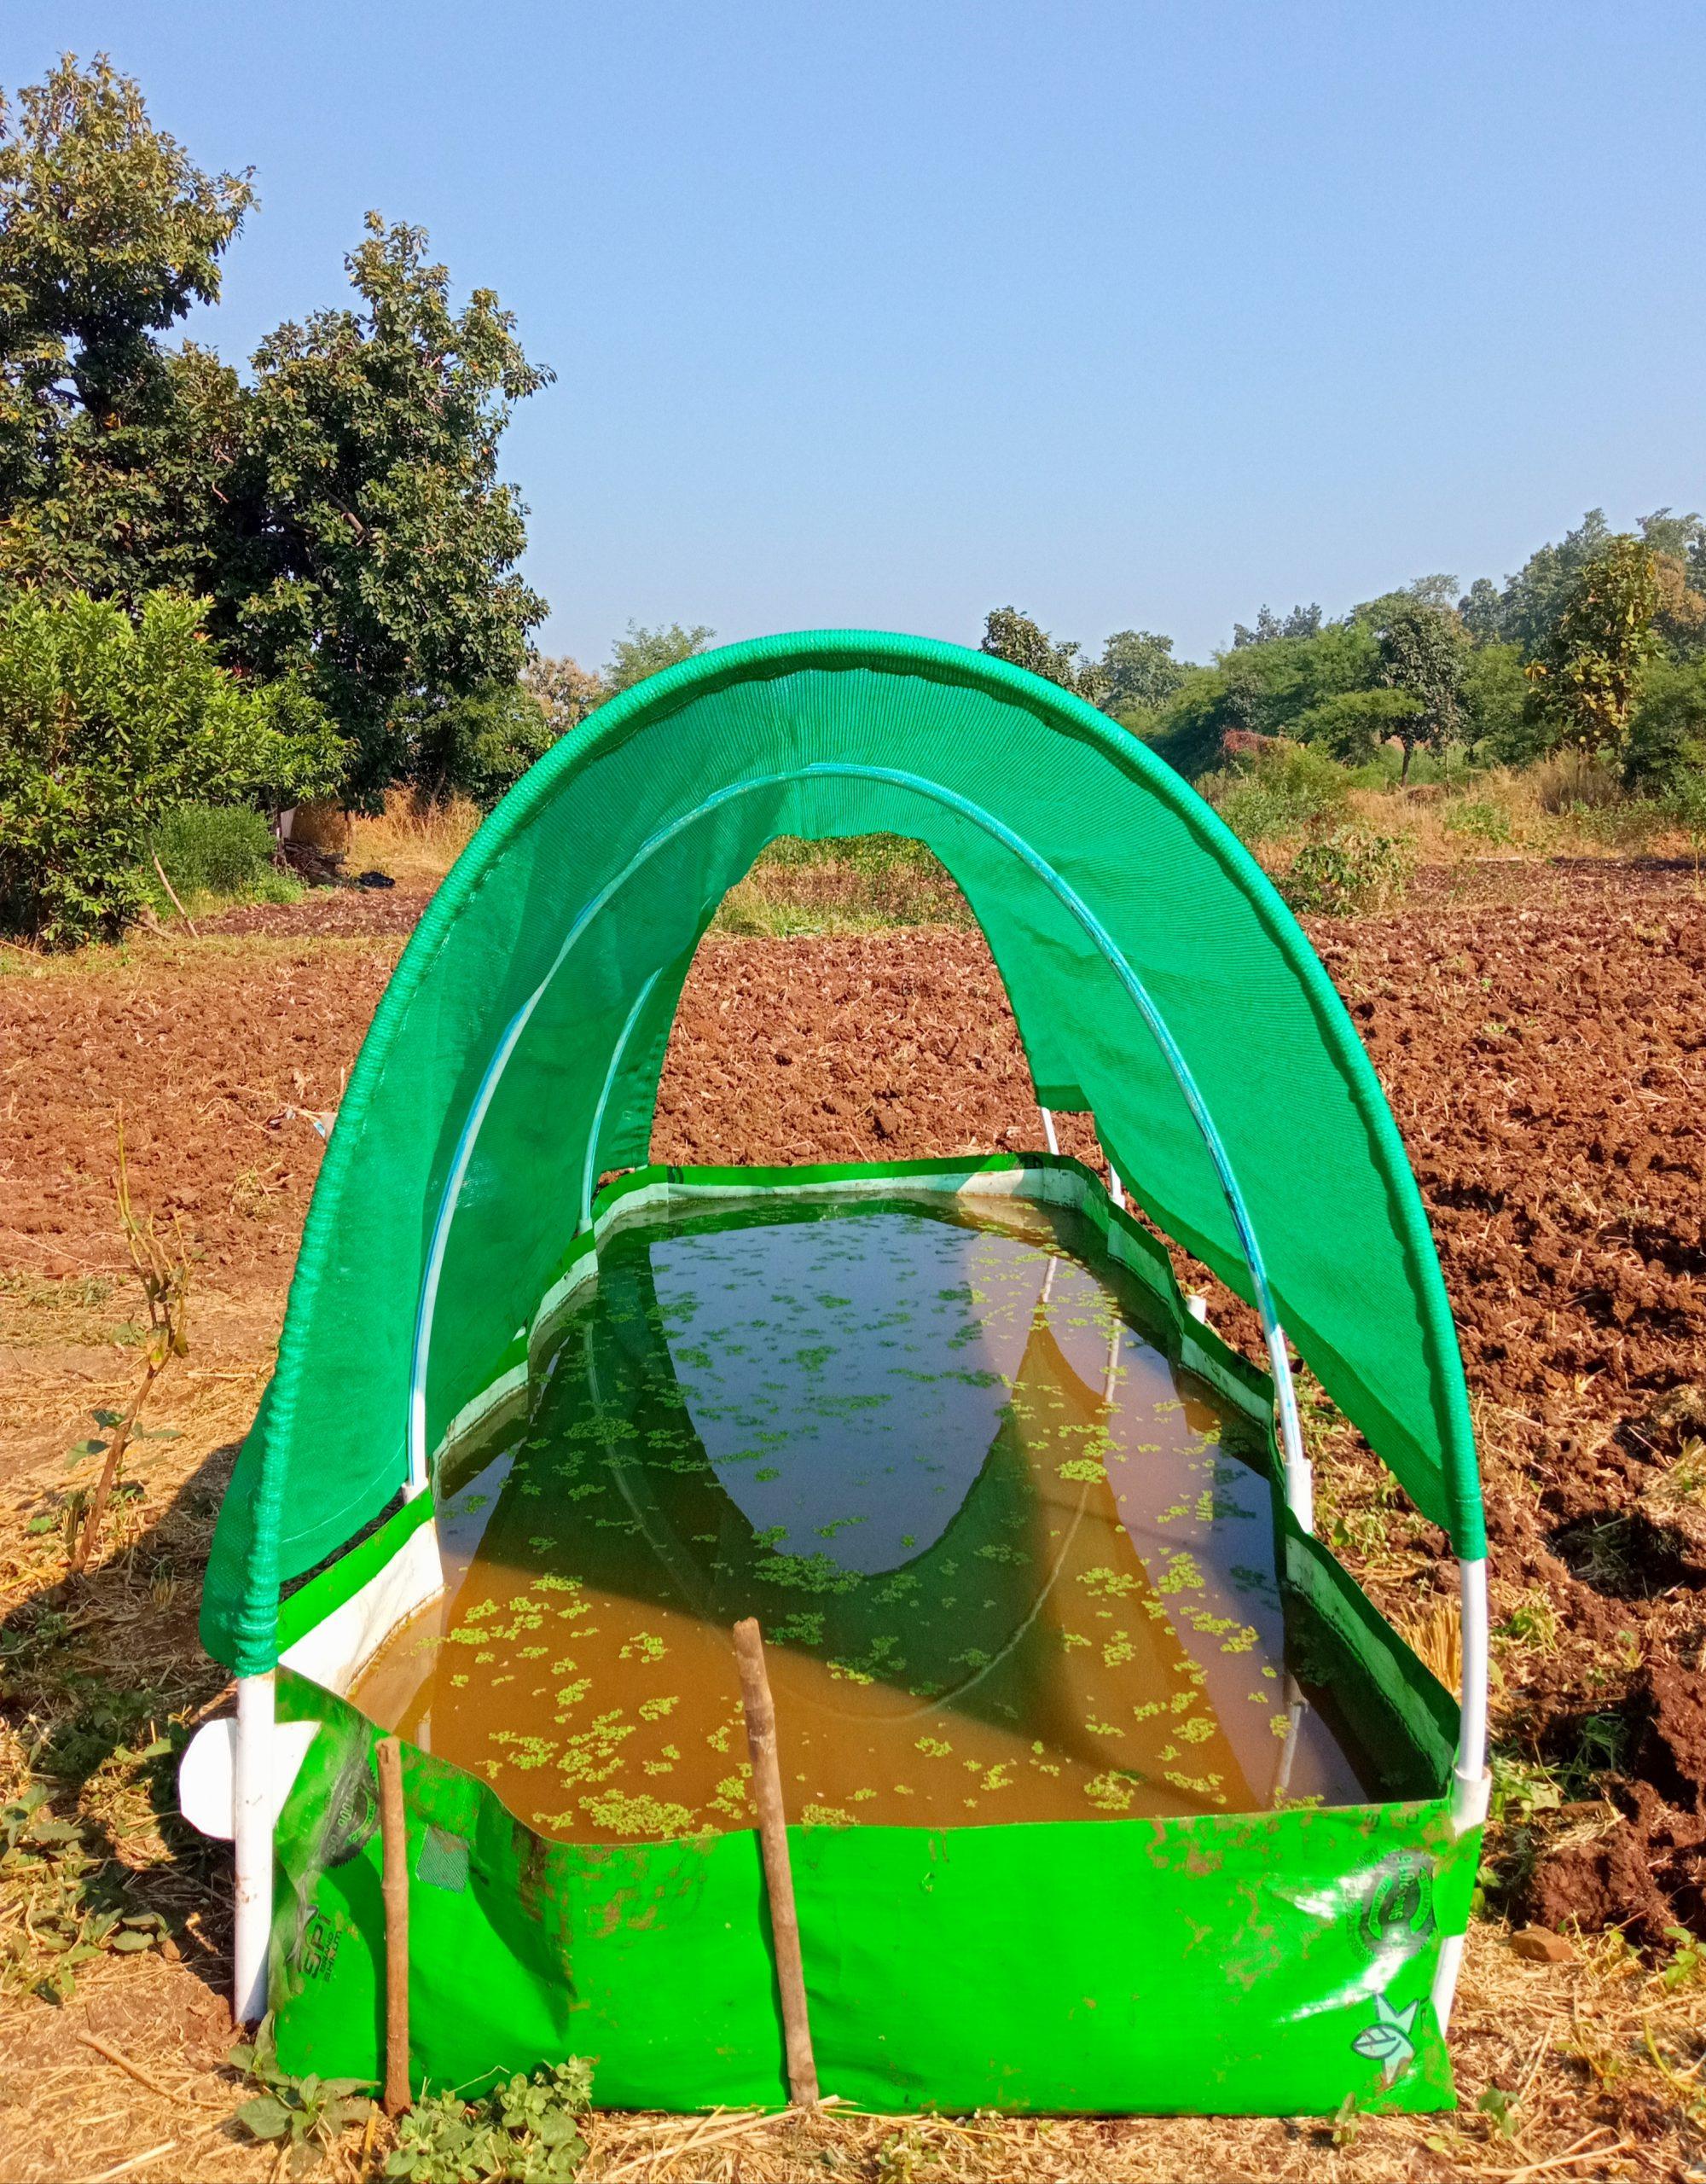 Organic fertilizer under a tent